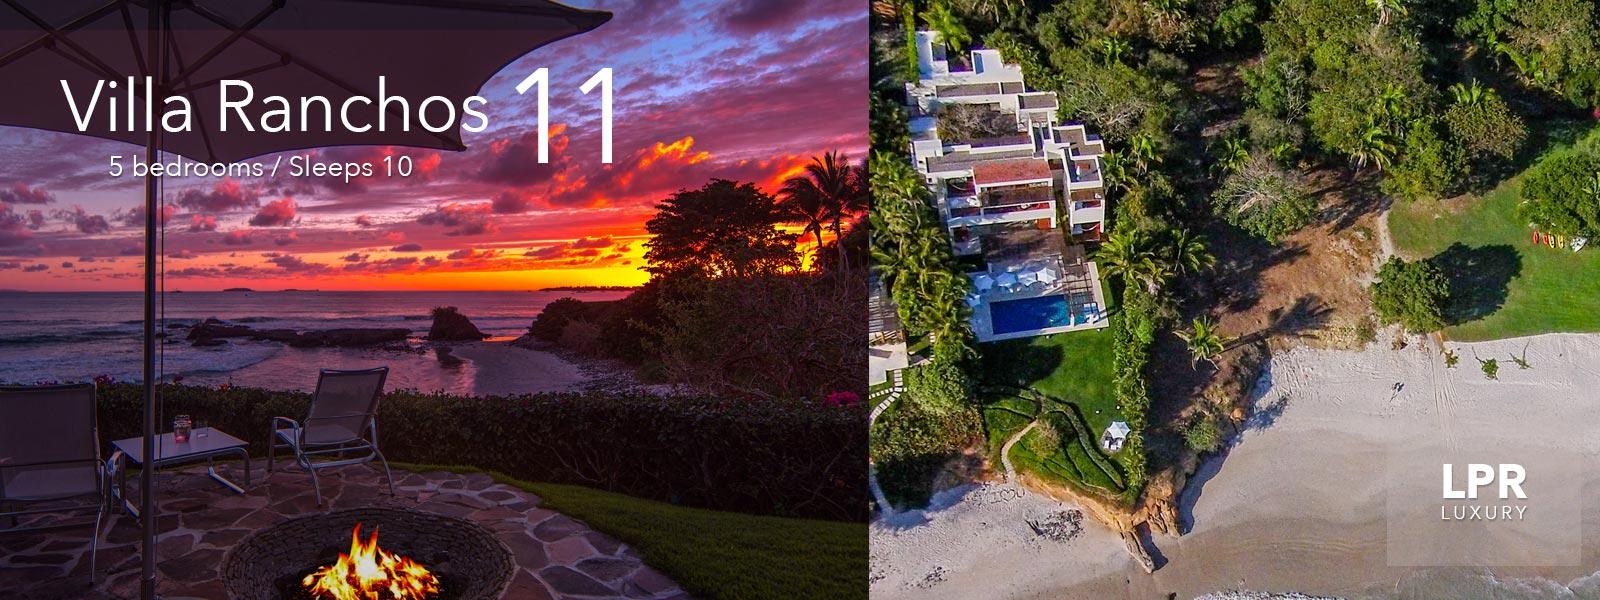 Villa Ranchos 11 - Luxury Punta Mita Vacation Rentals on Ranchos Beach at the Punta Mita Resort